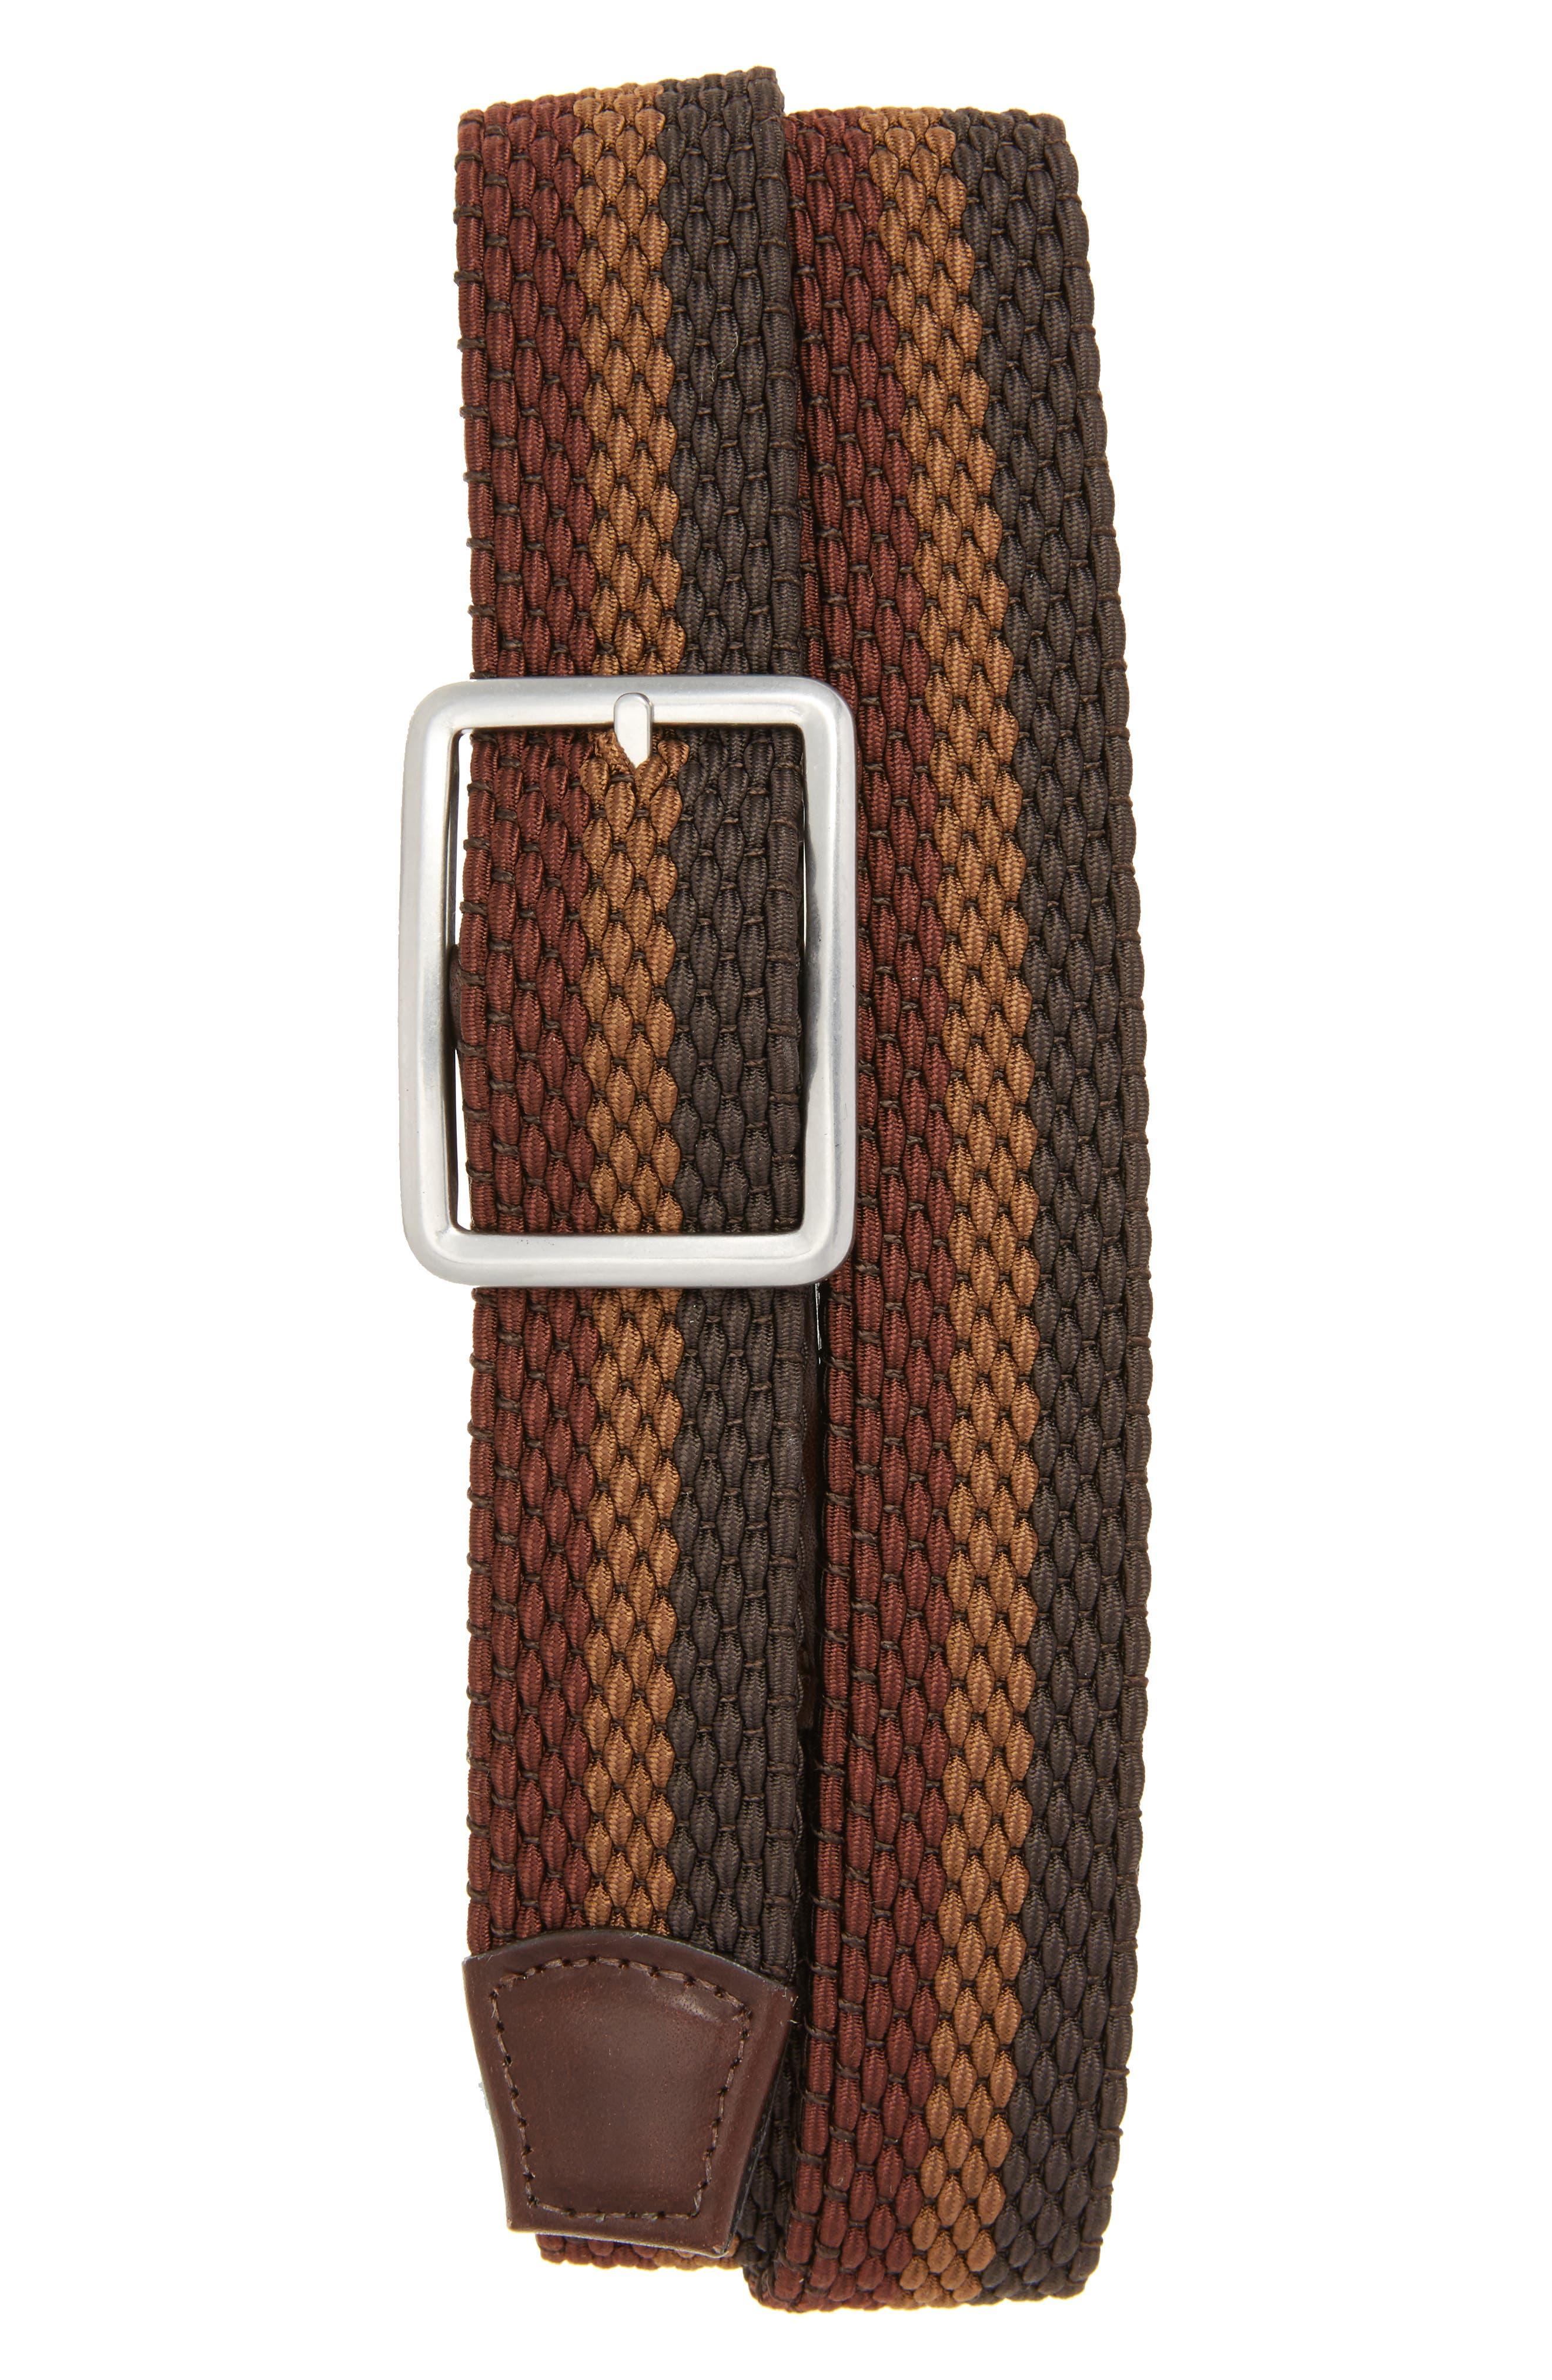 Alternate Image 1 Selected - Torino Belts Tri Stripe Reversible Woven Belt